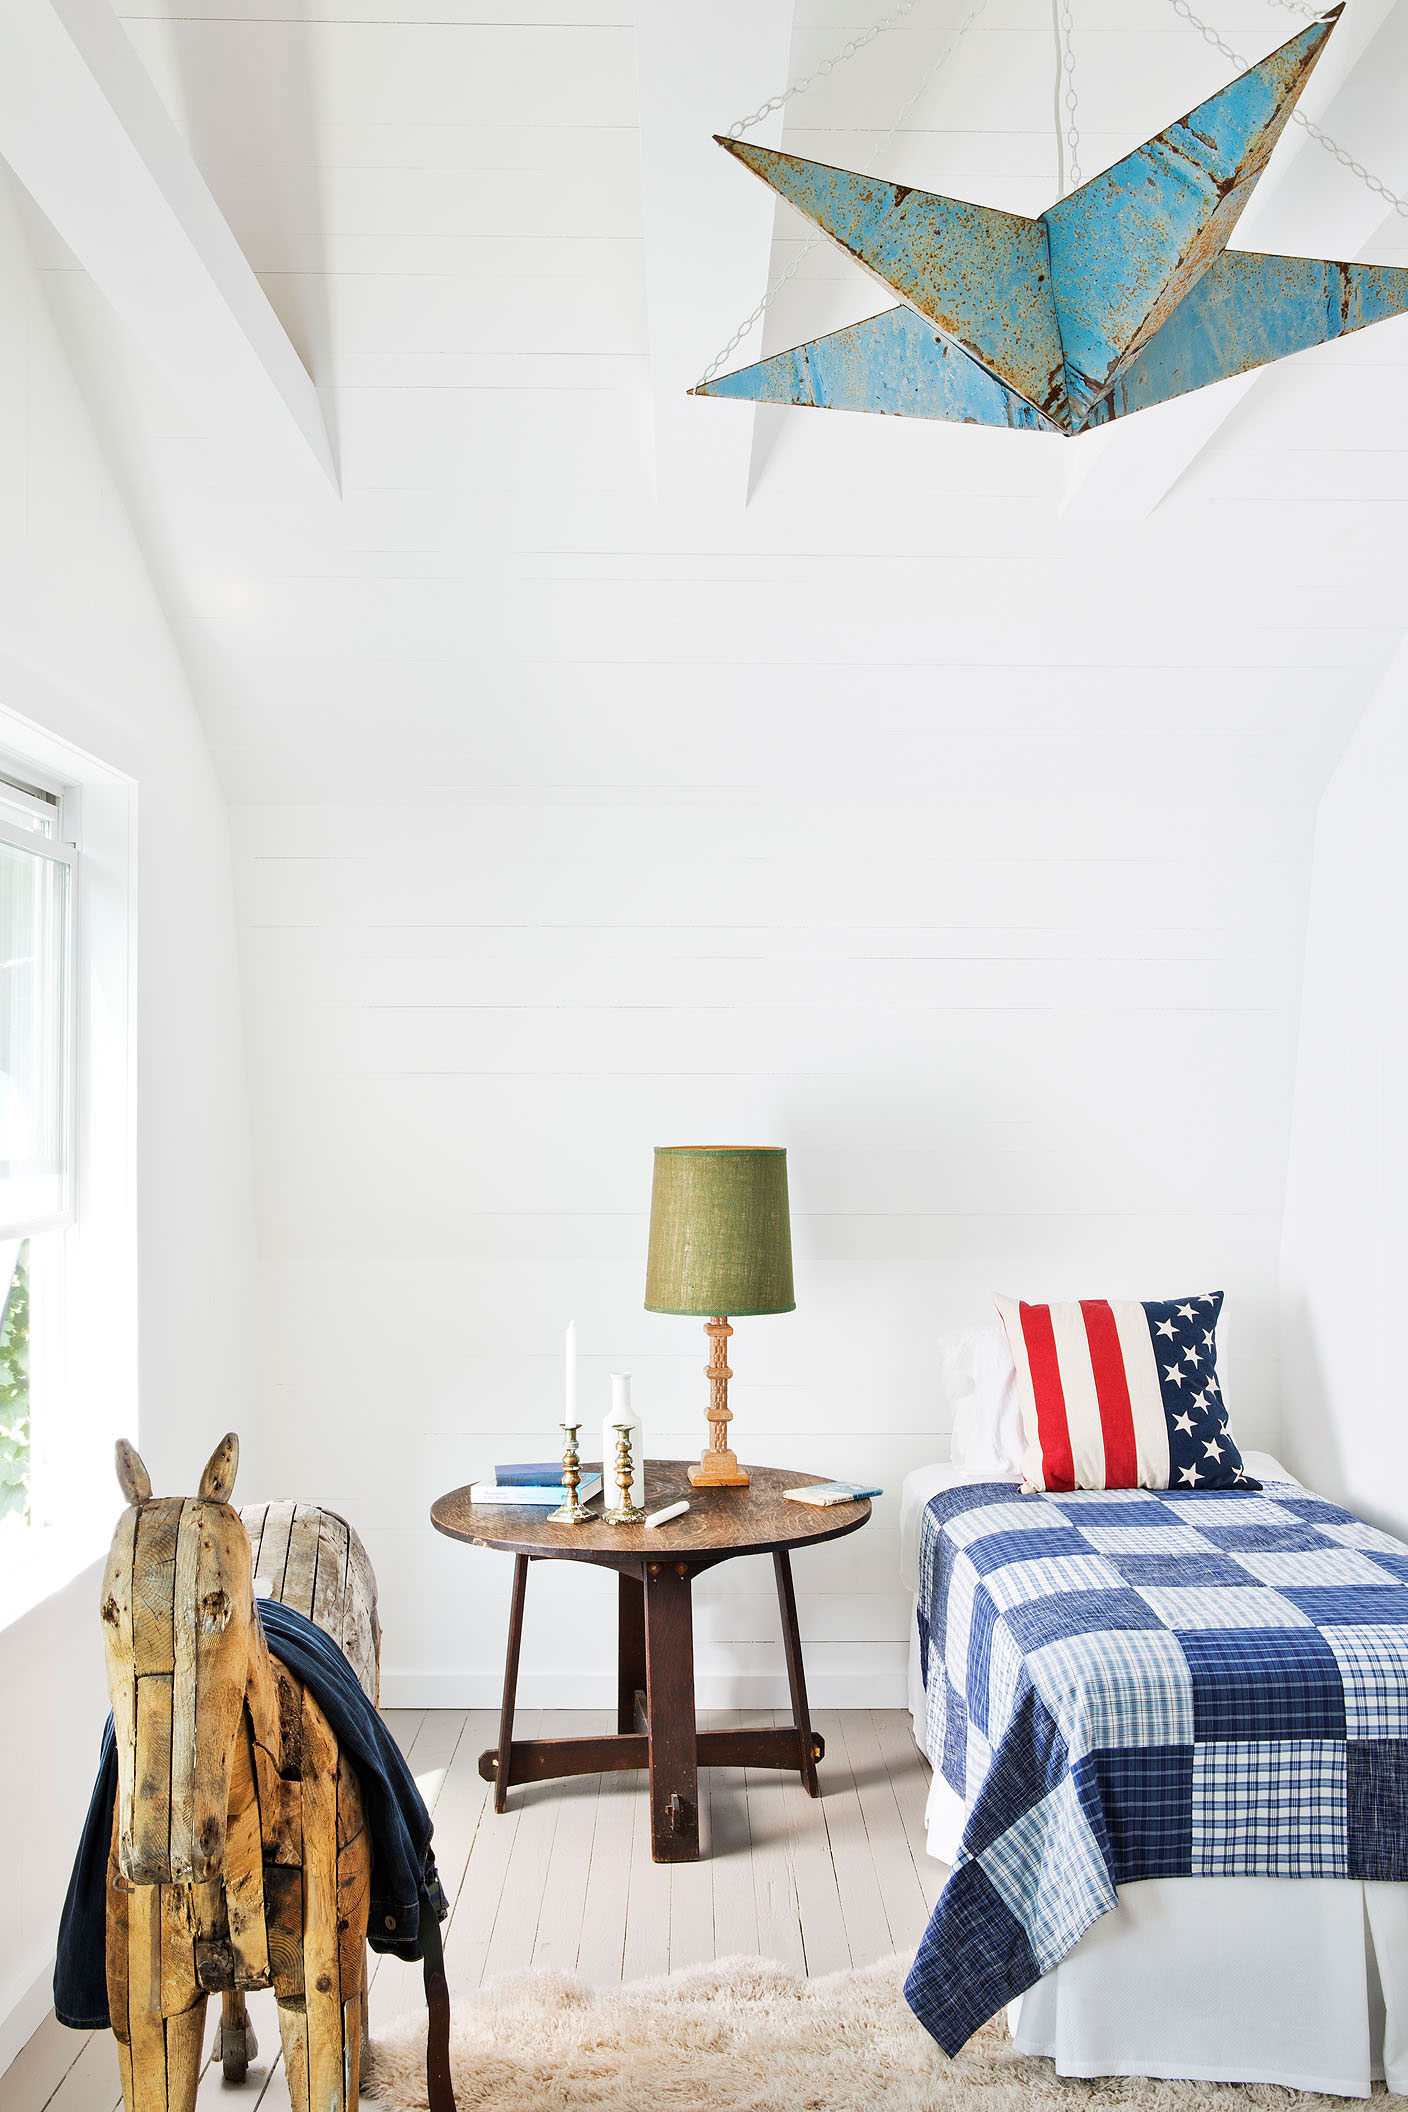 serge-castella-interiors-cottage-adirondaks-07